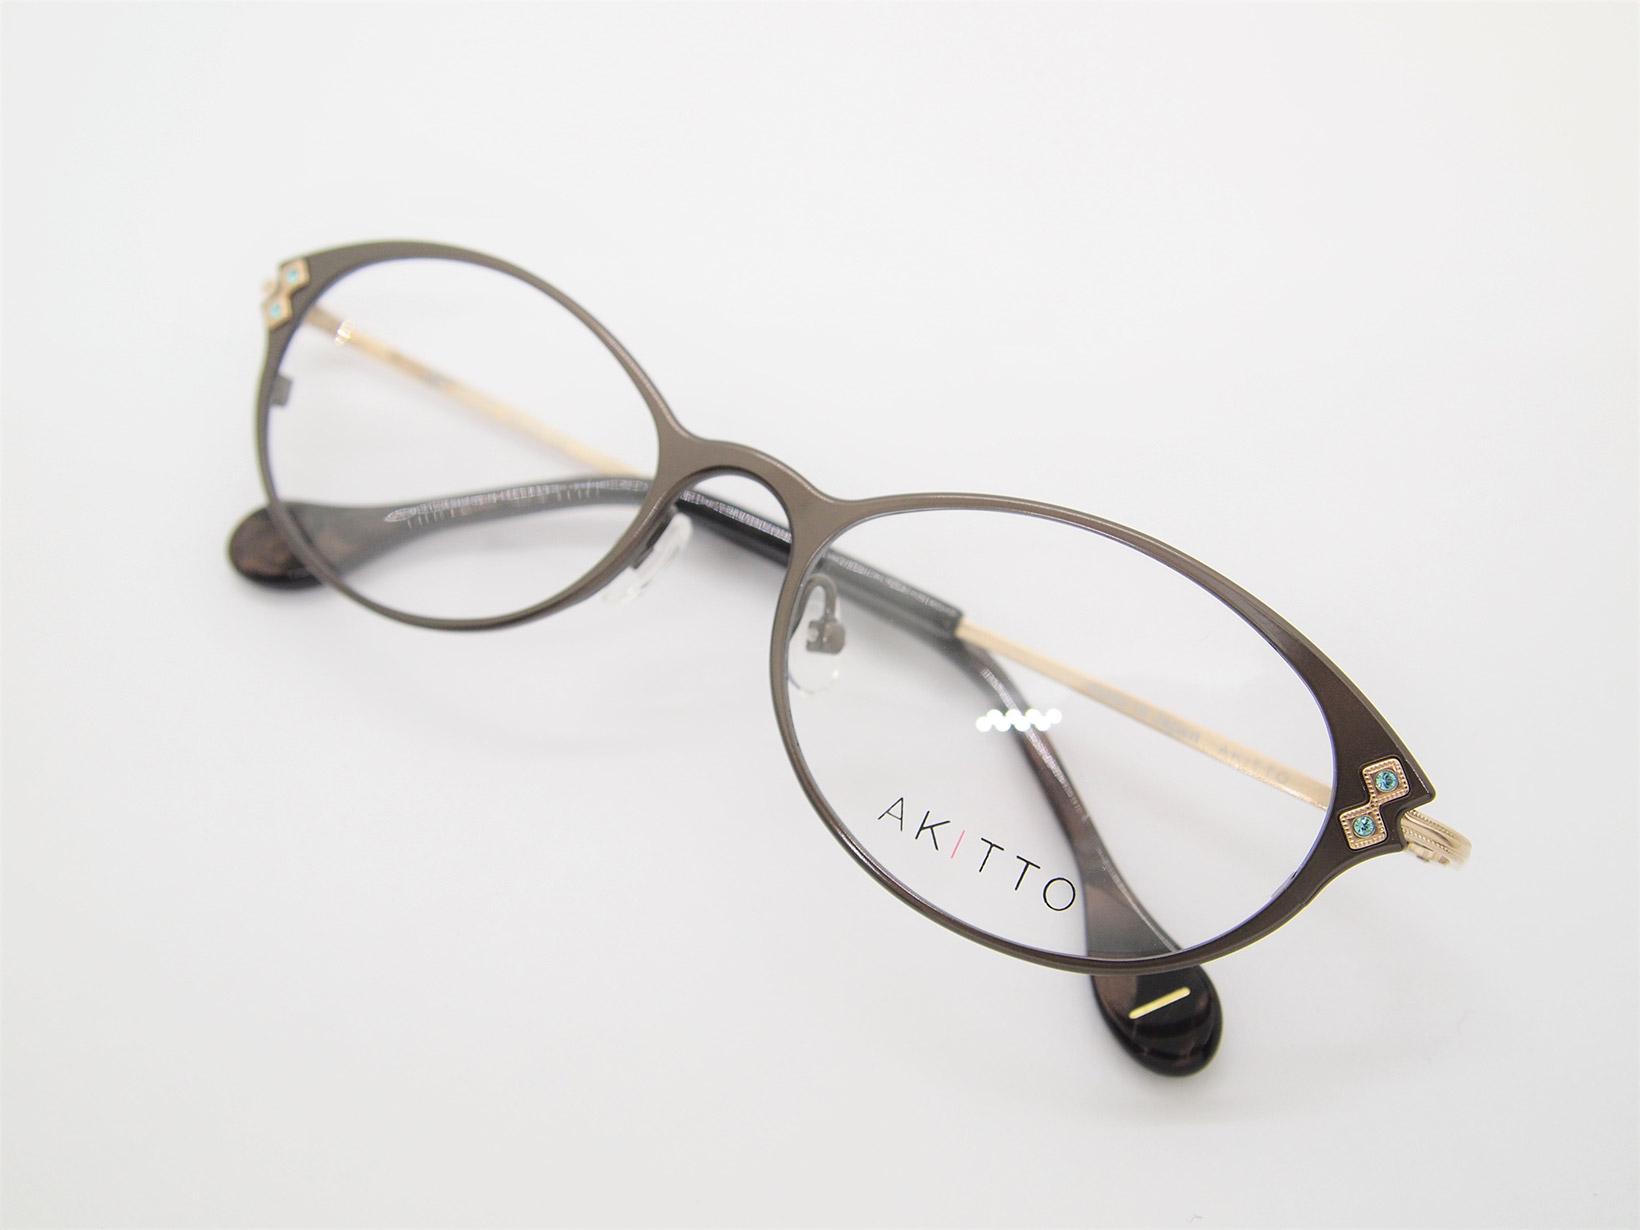 AKITTO 2021-2nd tap color|GS size:51□17 material:titanium+swarovski price:¥48,950-(税込み)